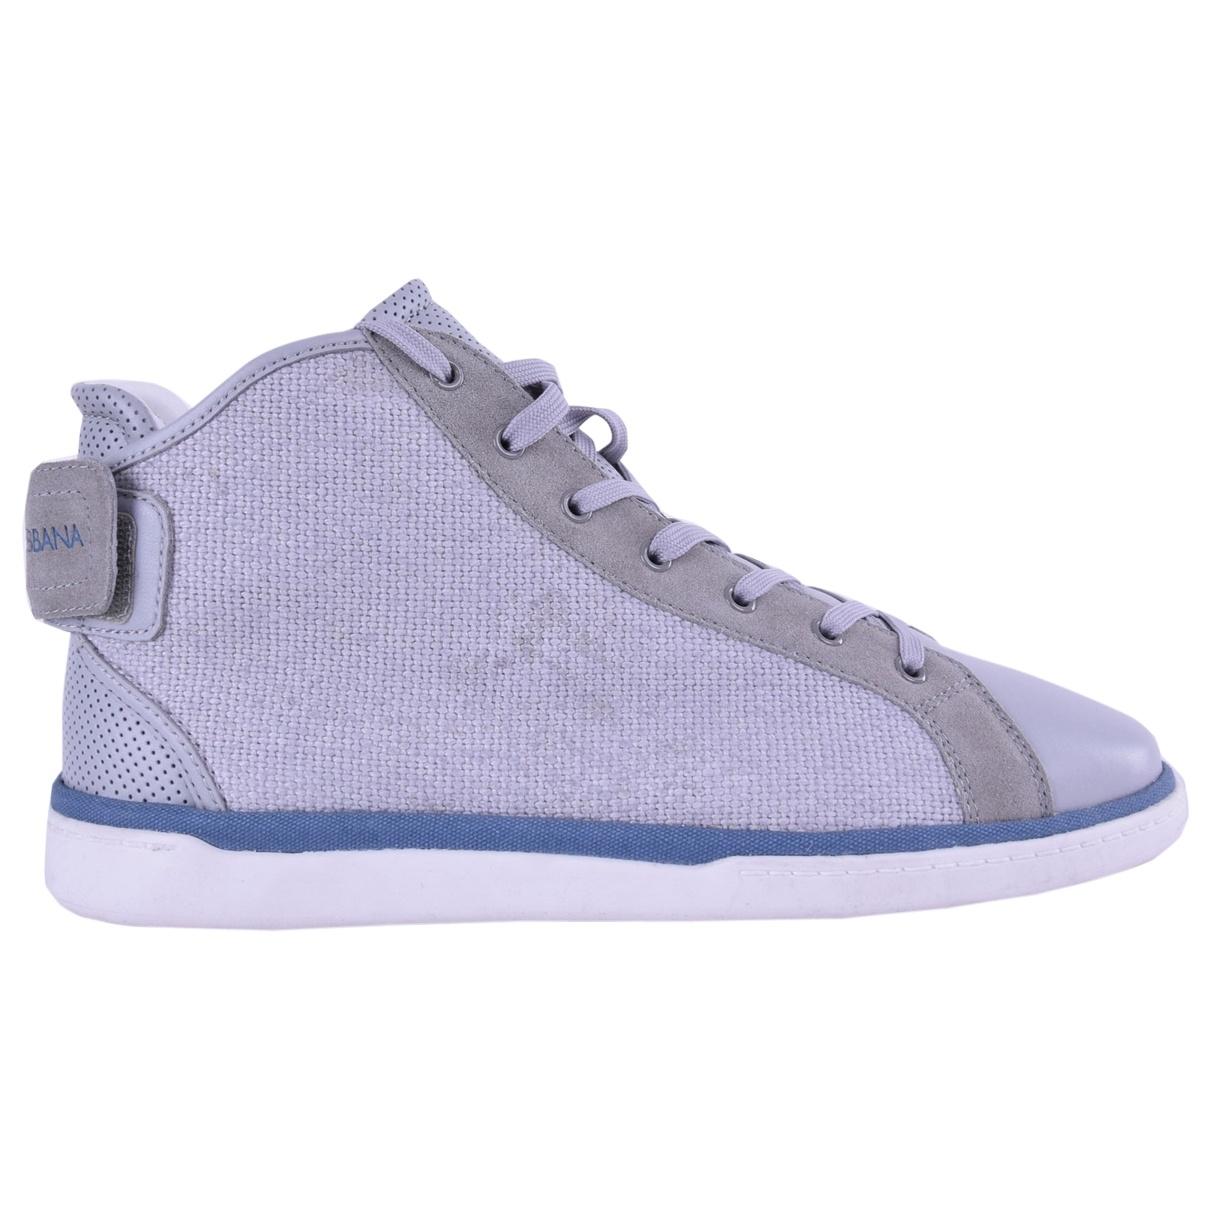 Dolce & Gabbana \N Grey Cloth Trainers for Men 44.5 EU